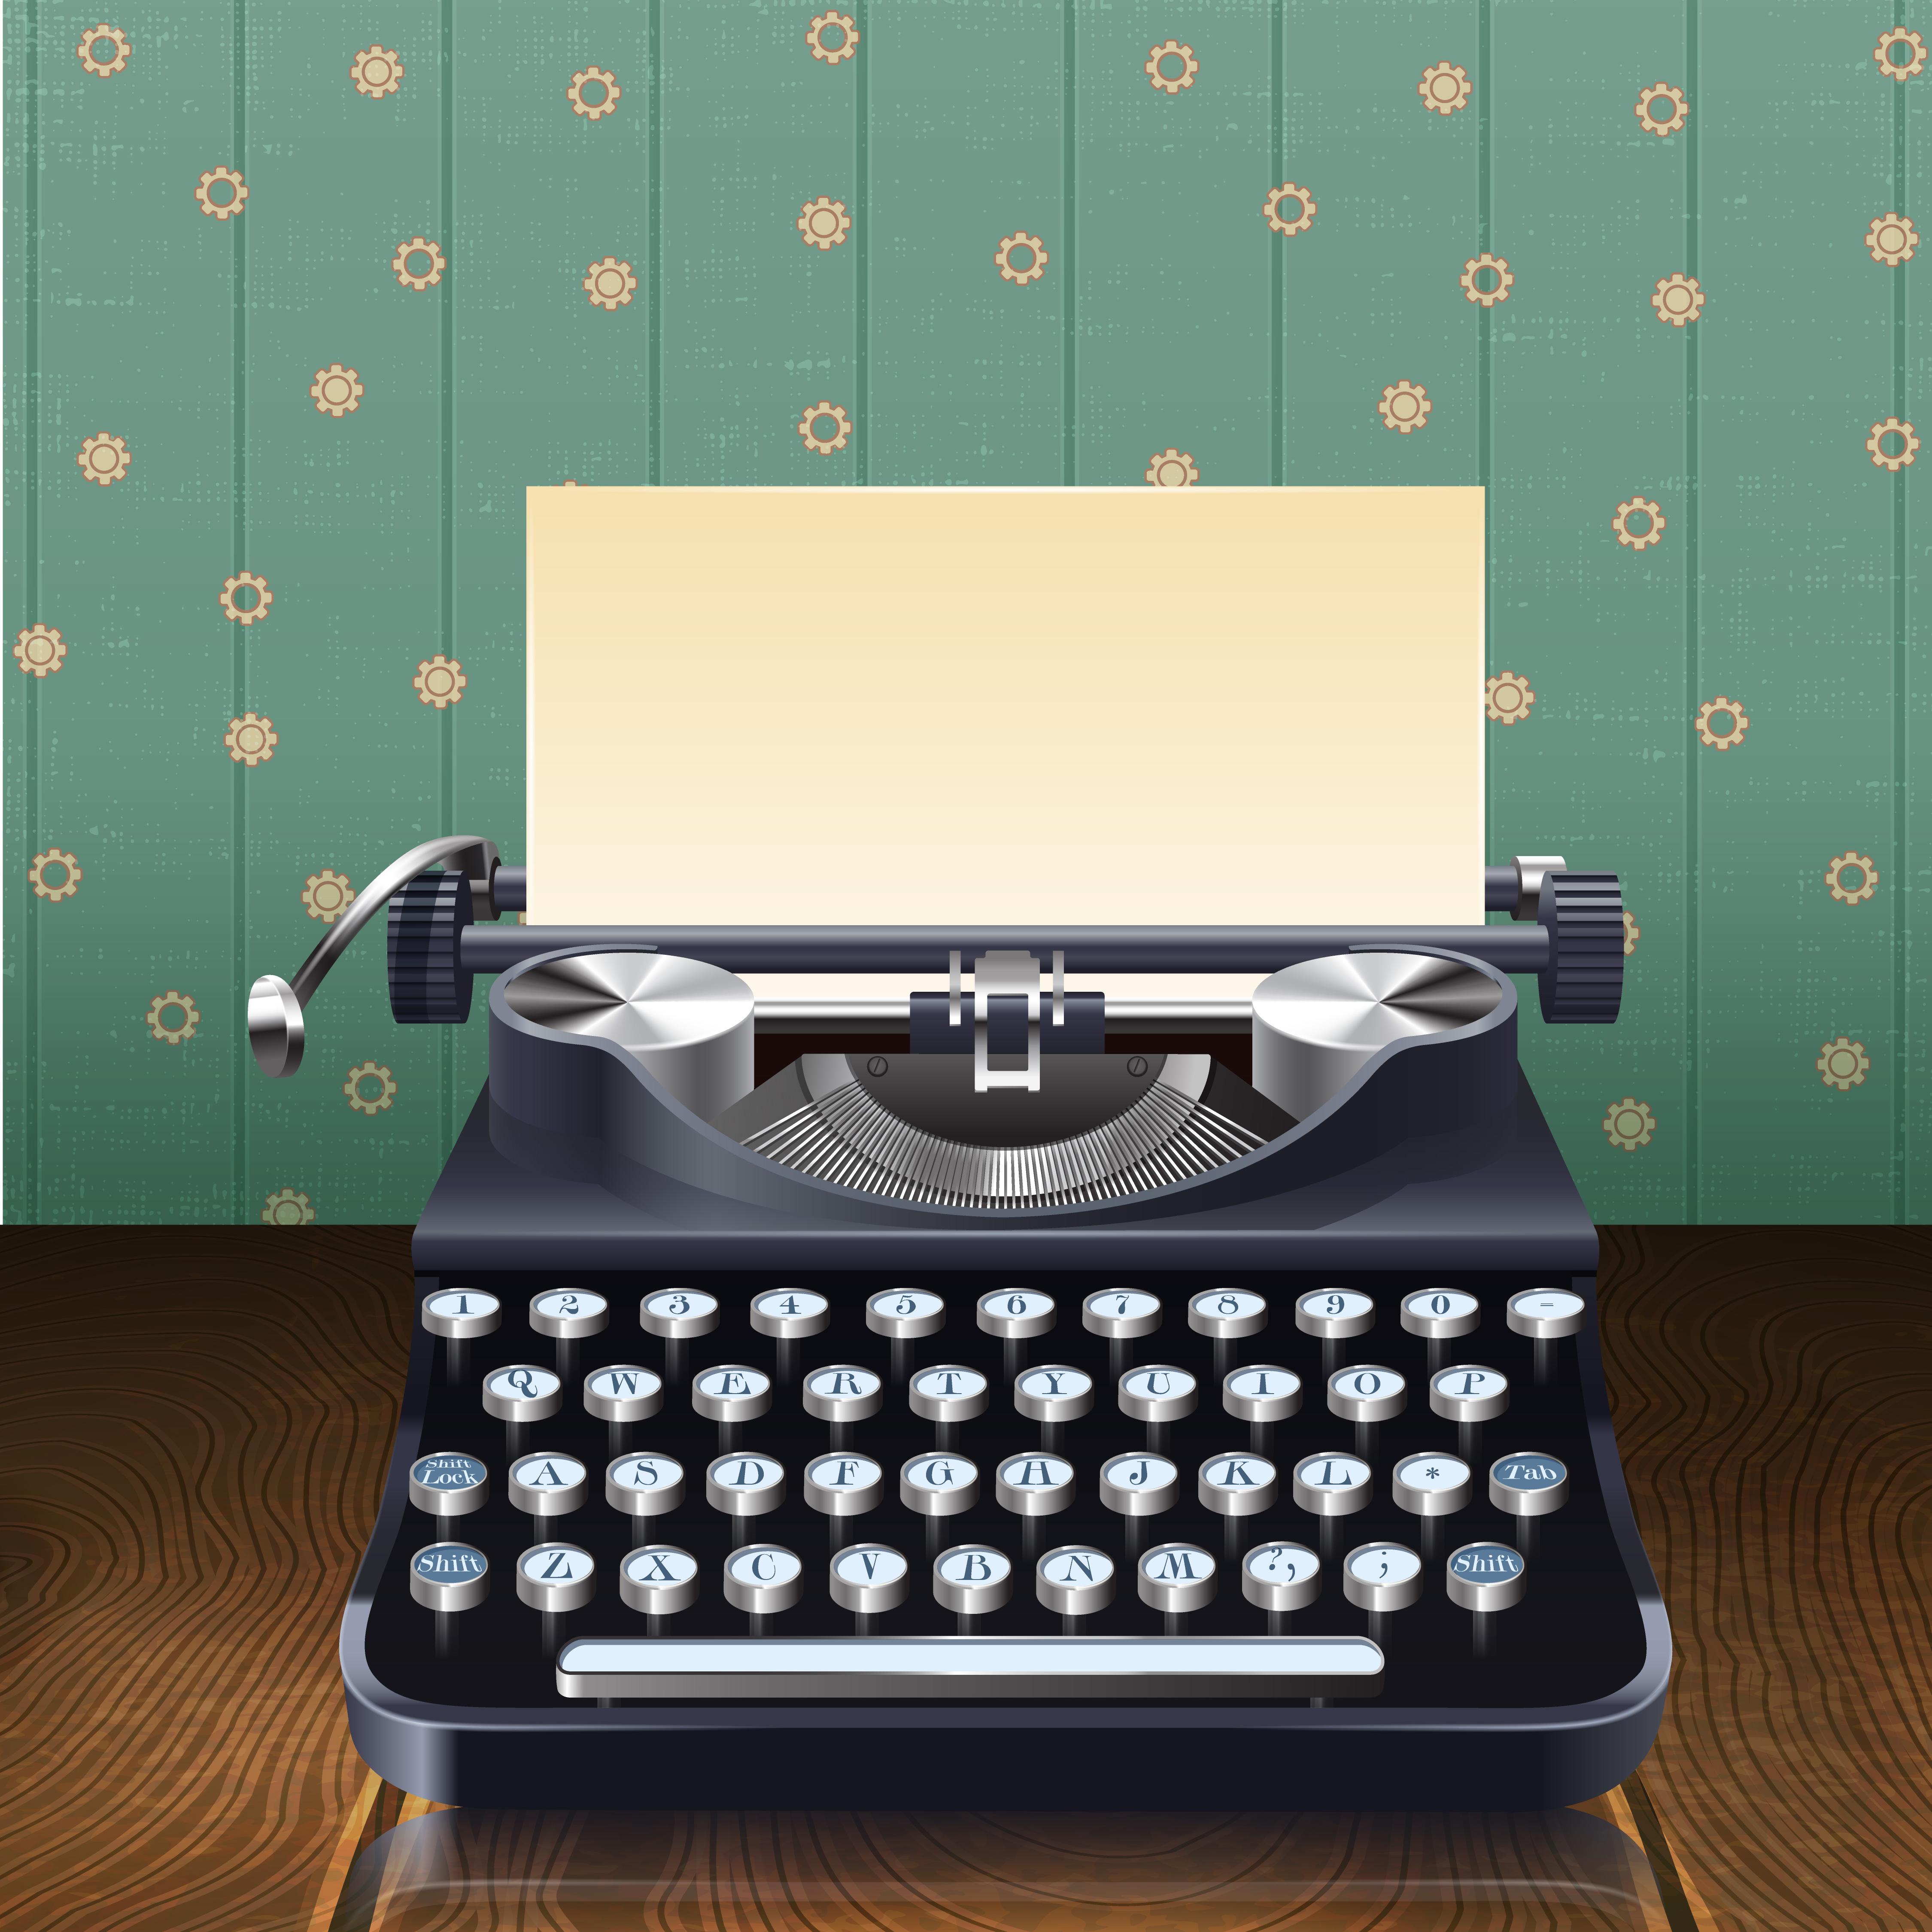 Vintage Secretary Desk >> Retro Style Typewriter - Download Free Vectors, Clipart ...